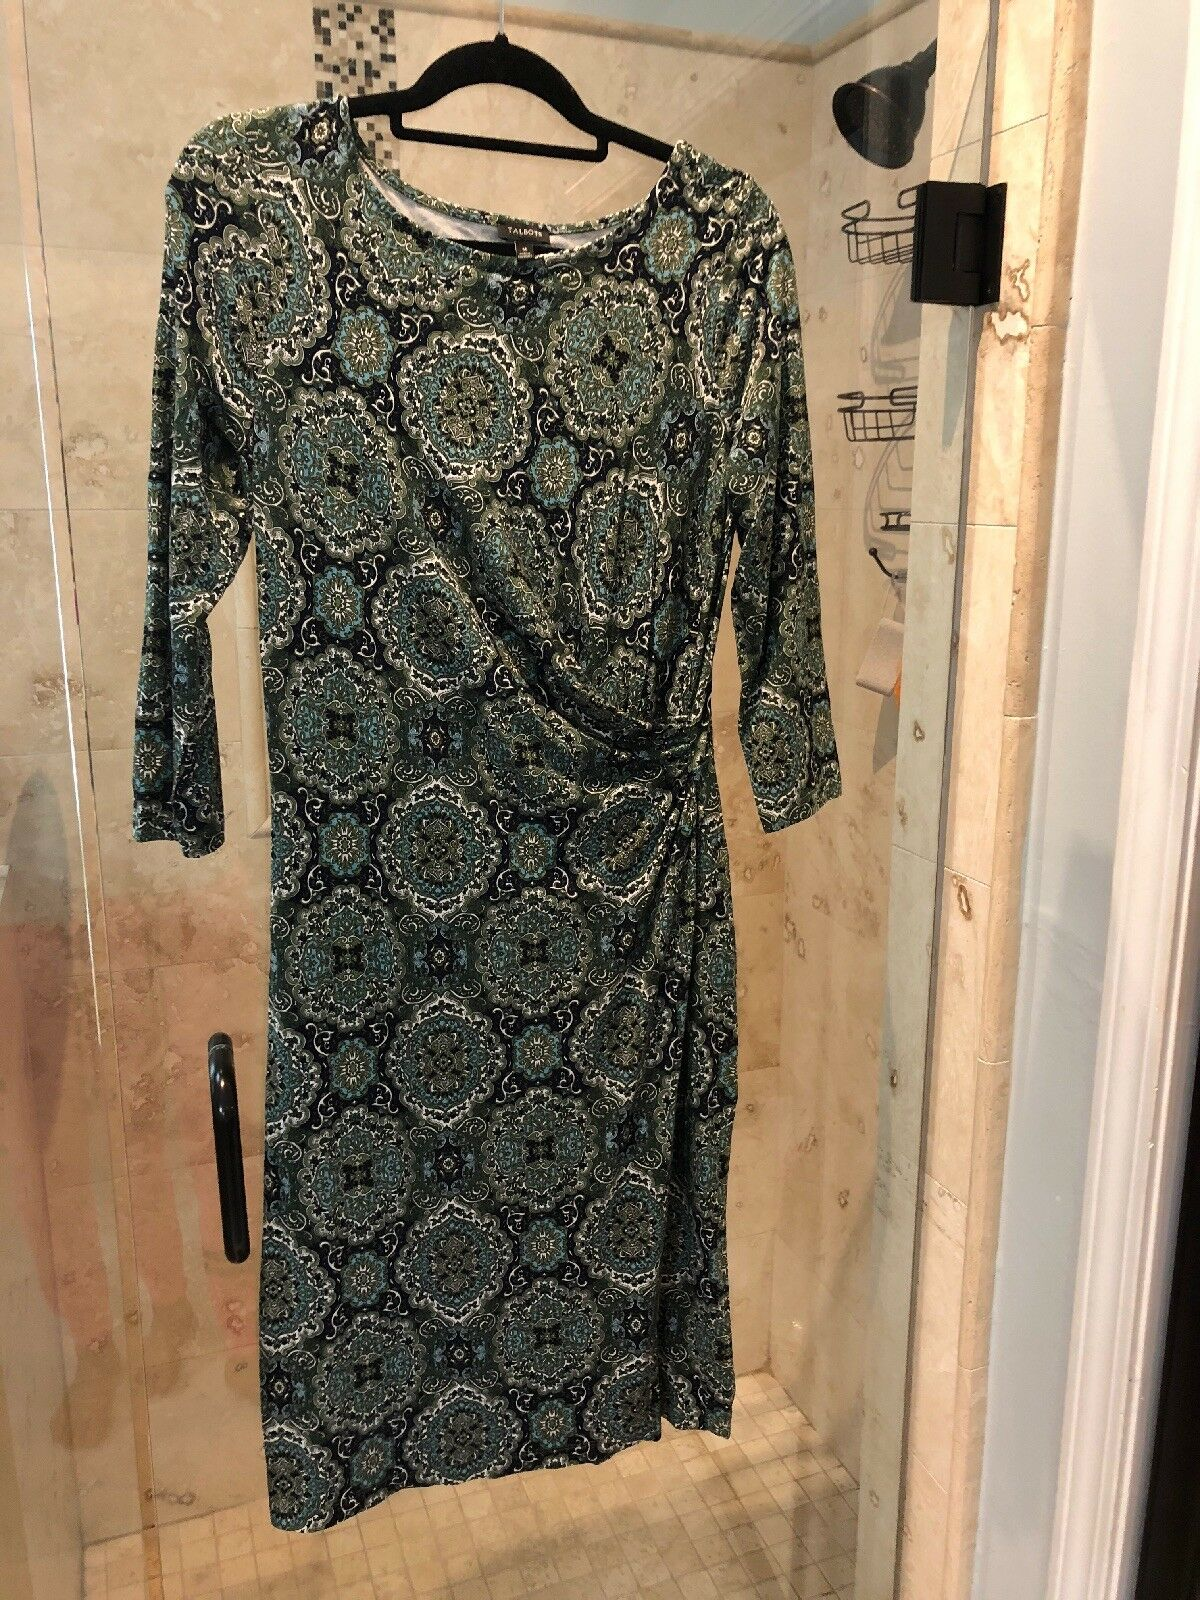 TALBOTS  109 Stretch Medallion Paisley Print Ruched Side Dress M Medium Worn 1x